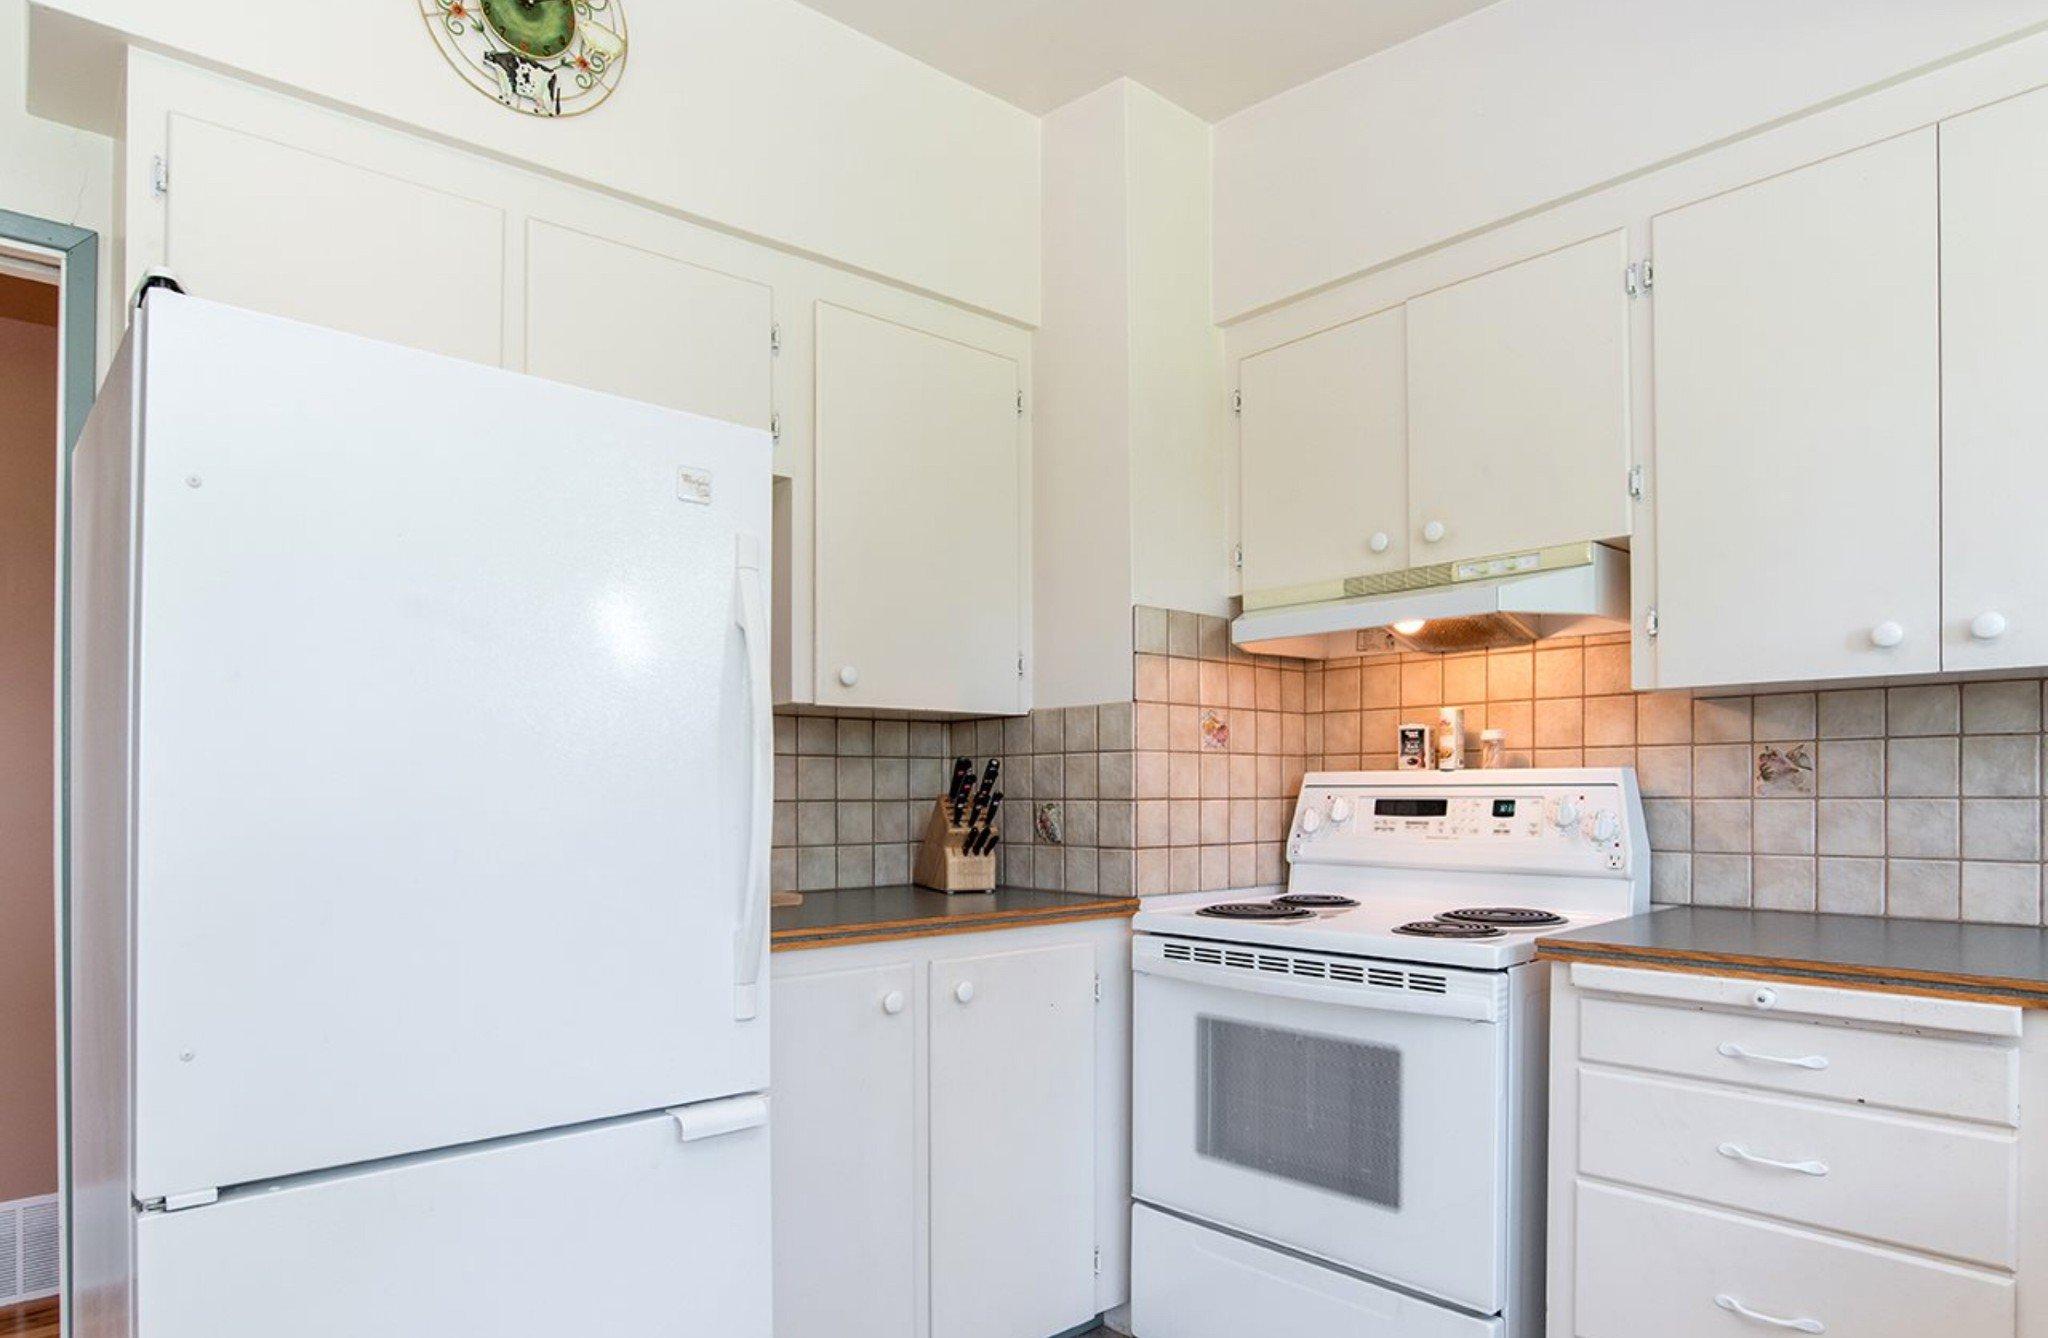 Photo 9: Photos: 10327 127A Street in Surrey: Cedar Hills House for sale : MLS®# R2178137